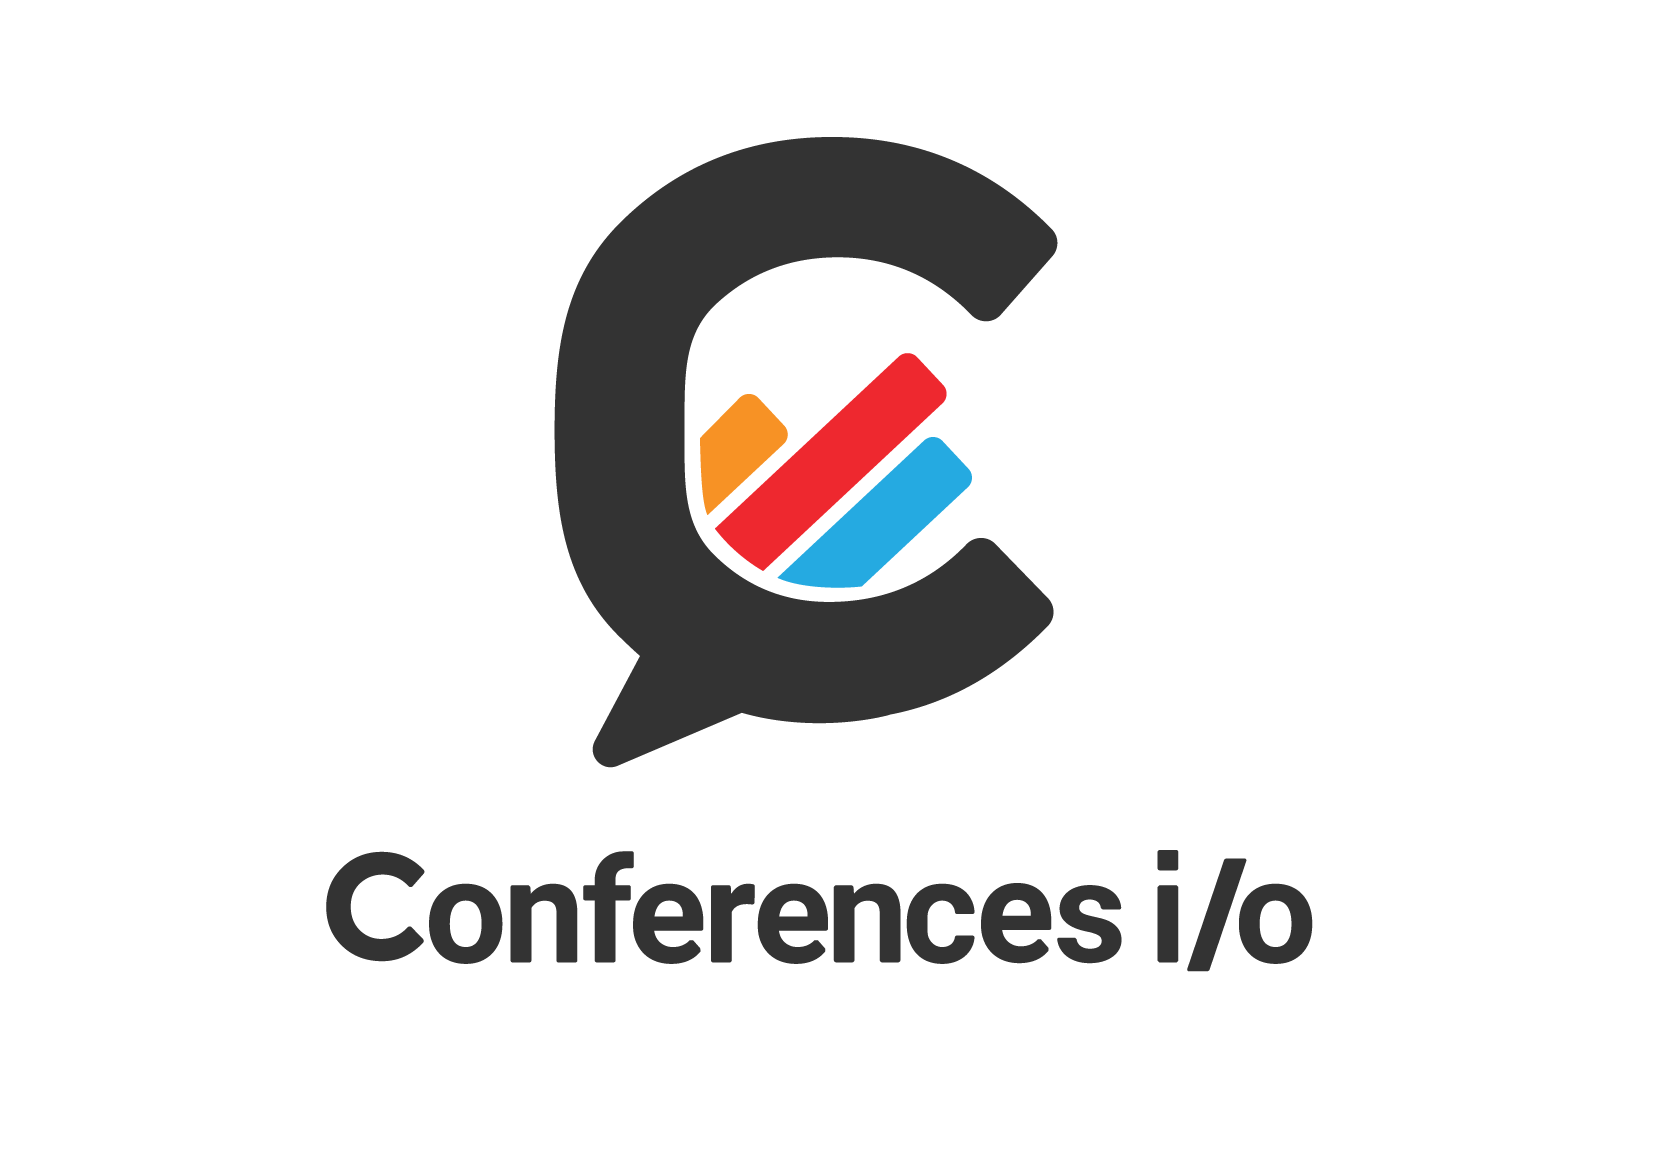 New Emblem for Event Technology Software